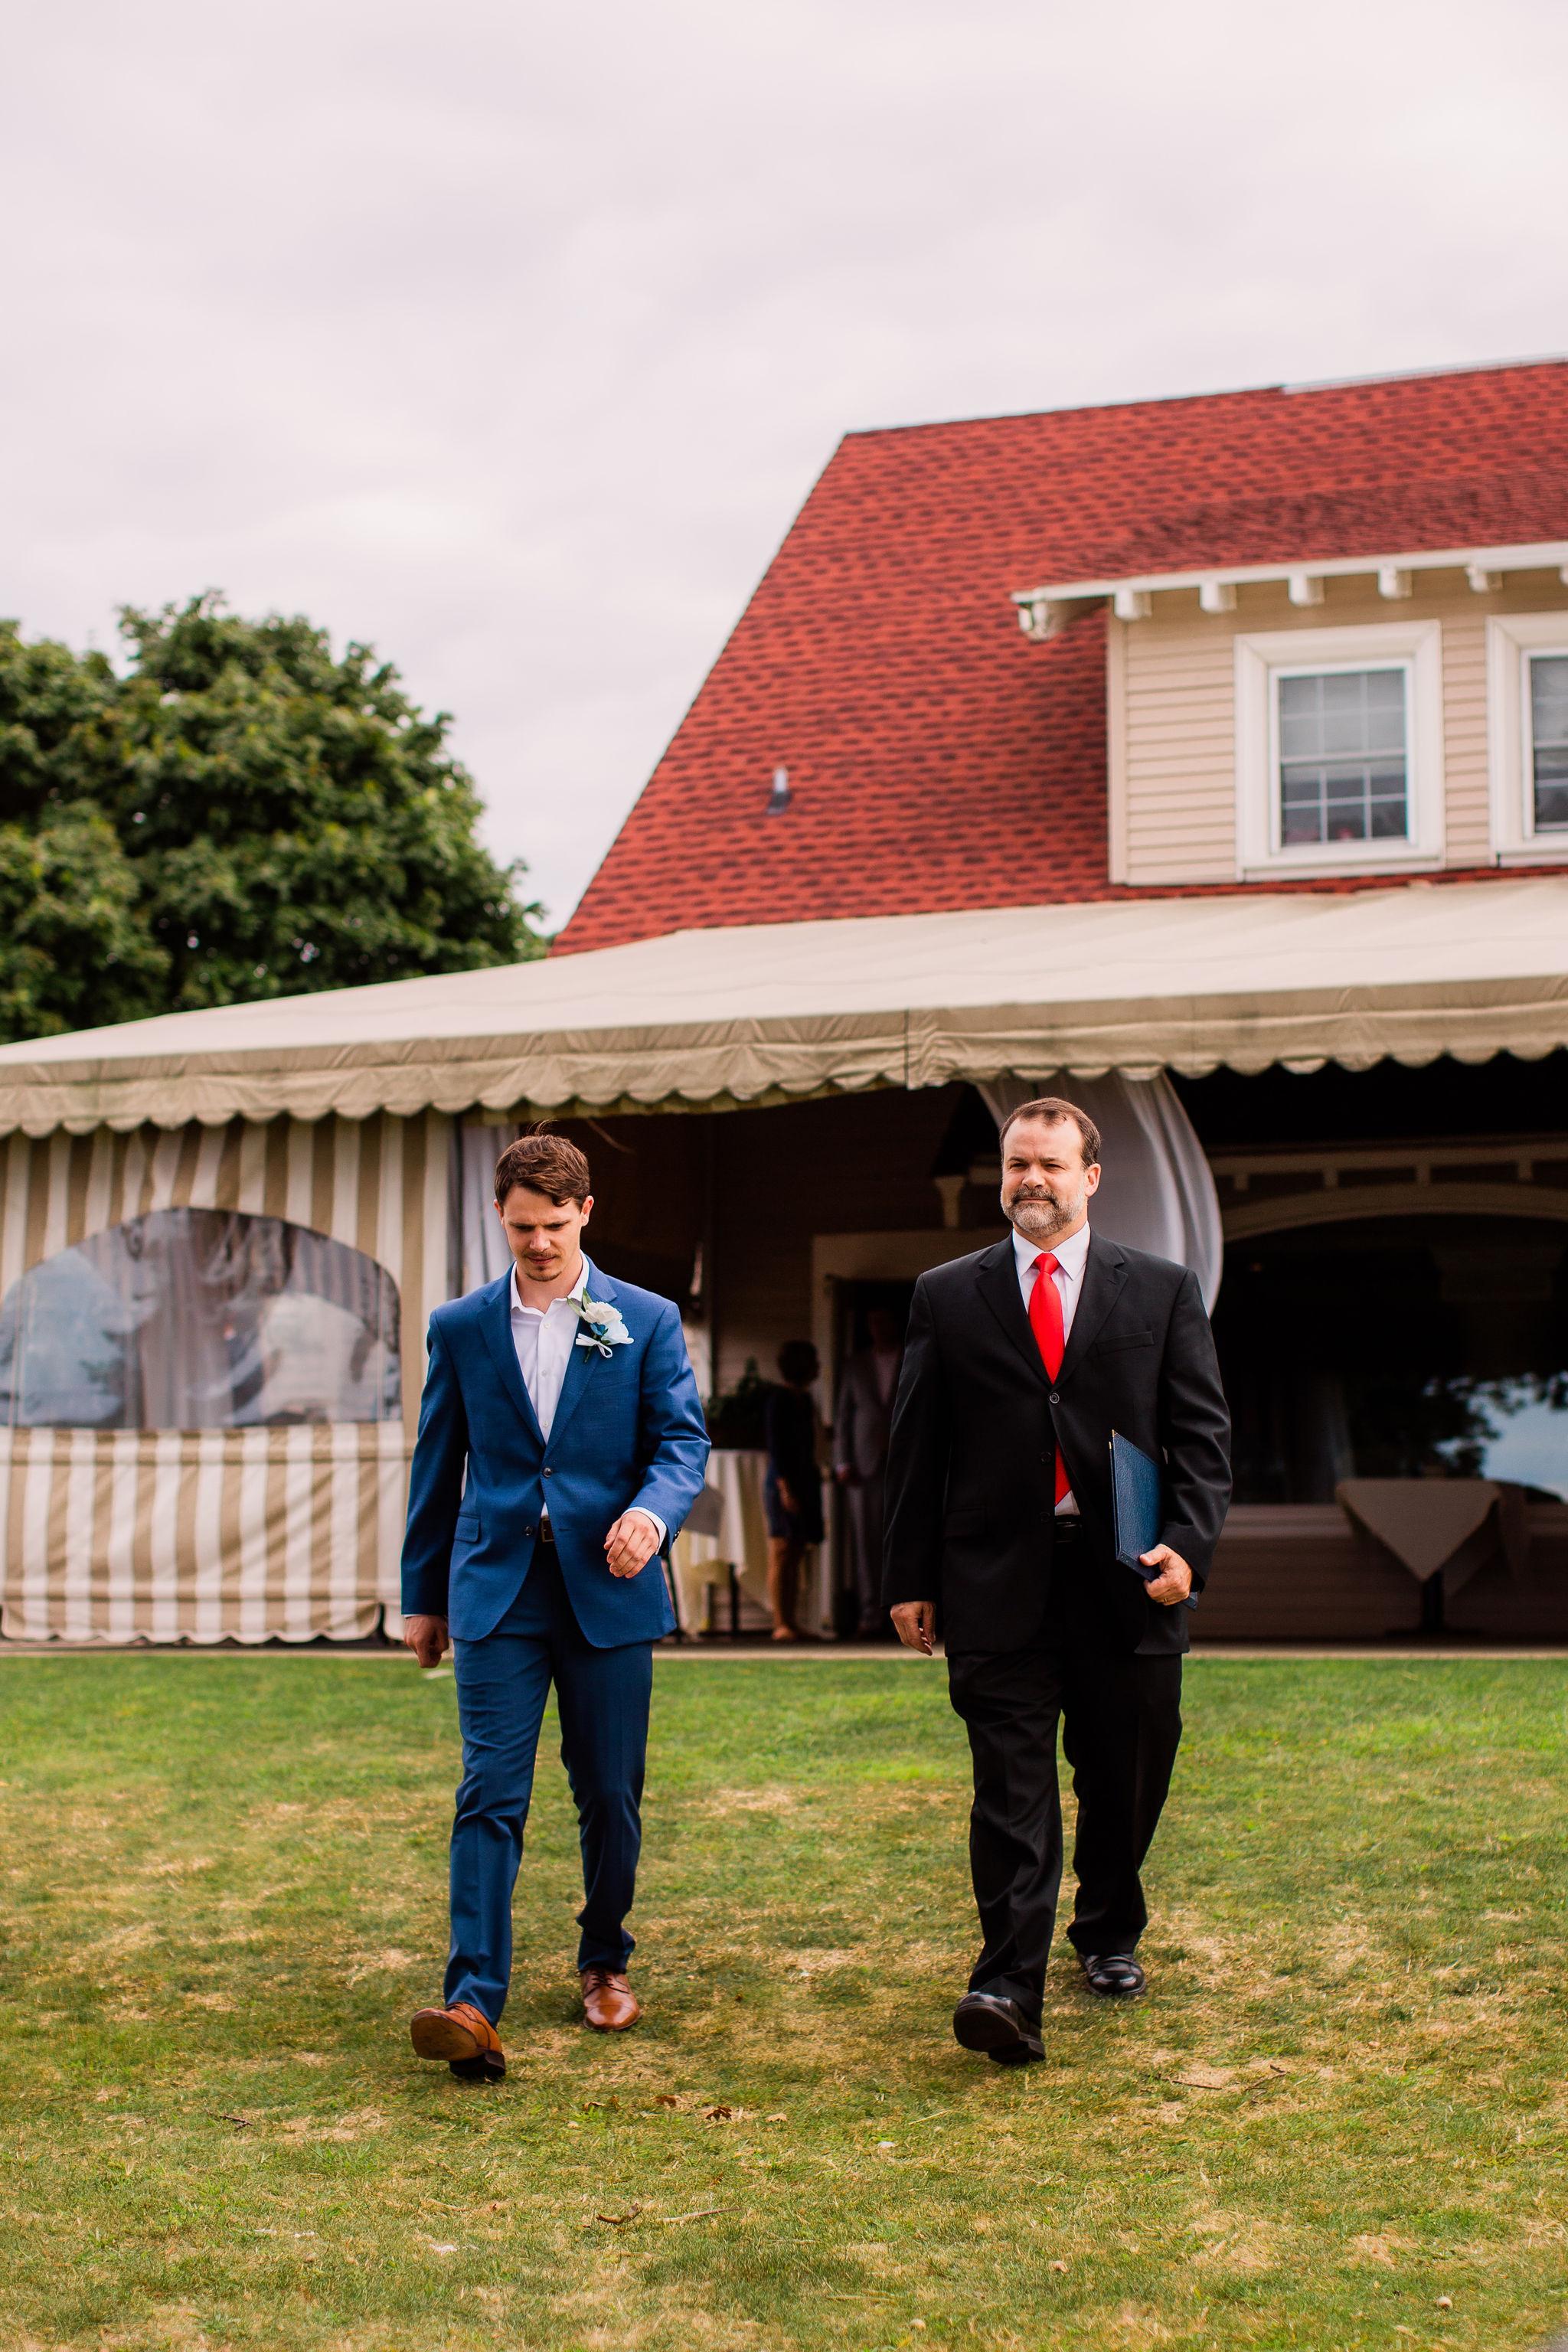 katie_graham_photography_bemus_point_wedding_photography_Photographer_jamestown_new_york_lakewood